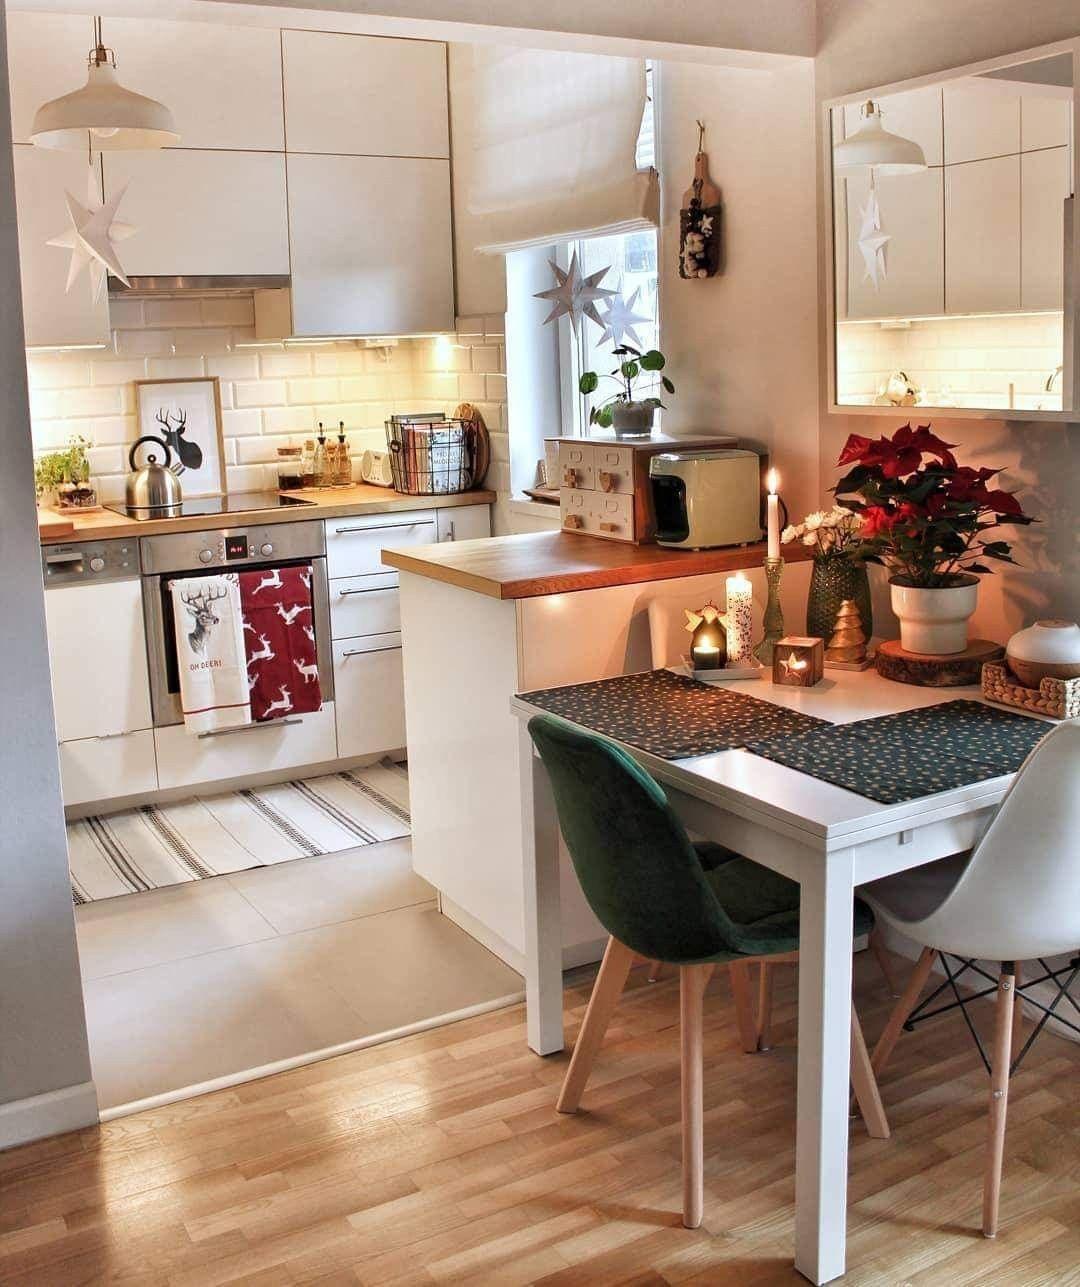 Pinterest Eydeirrac Small Apartment Kitchen Home Decor Kitchen Kitchen Design Small